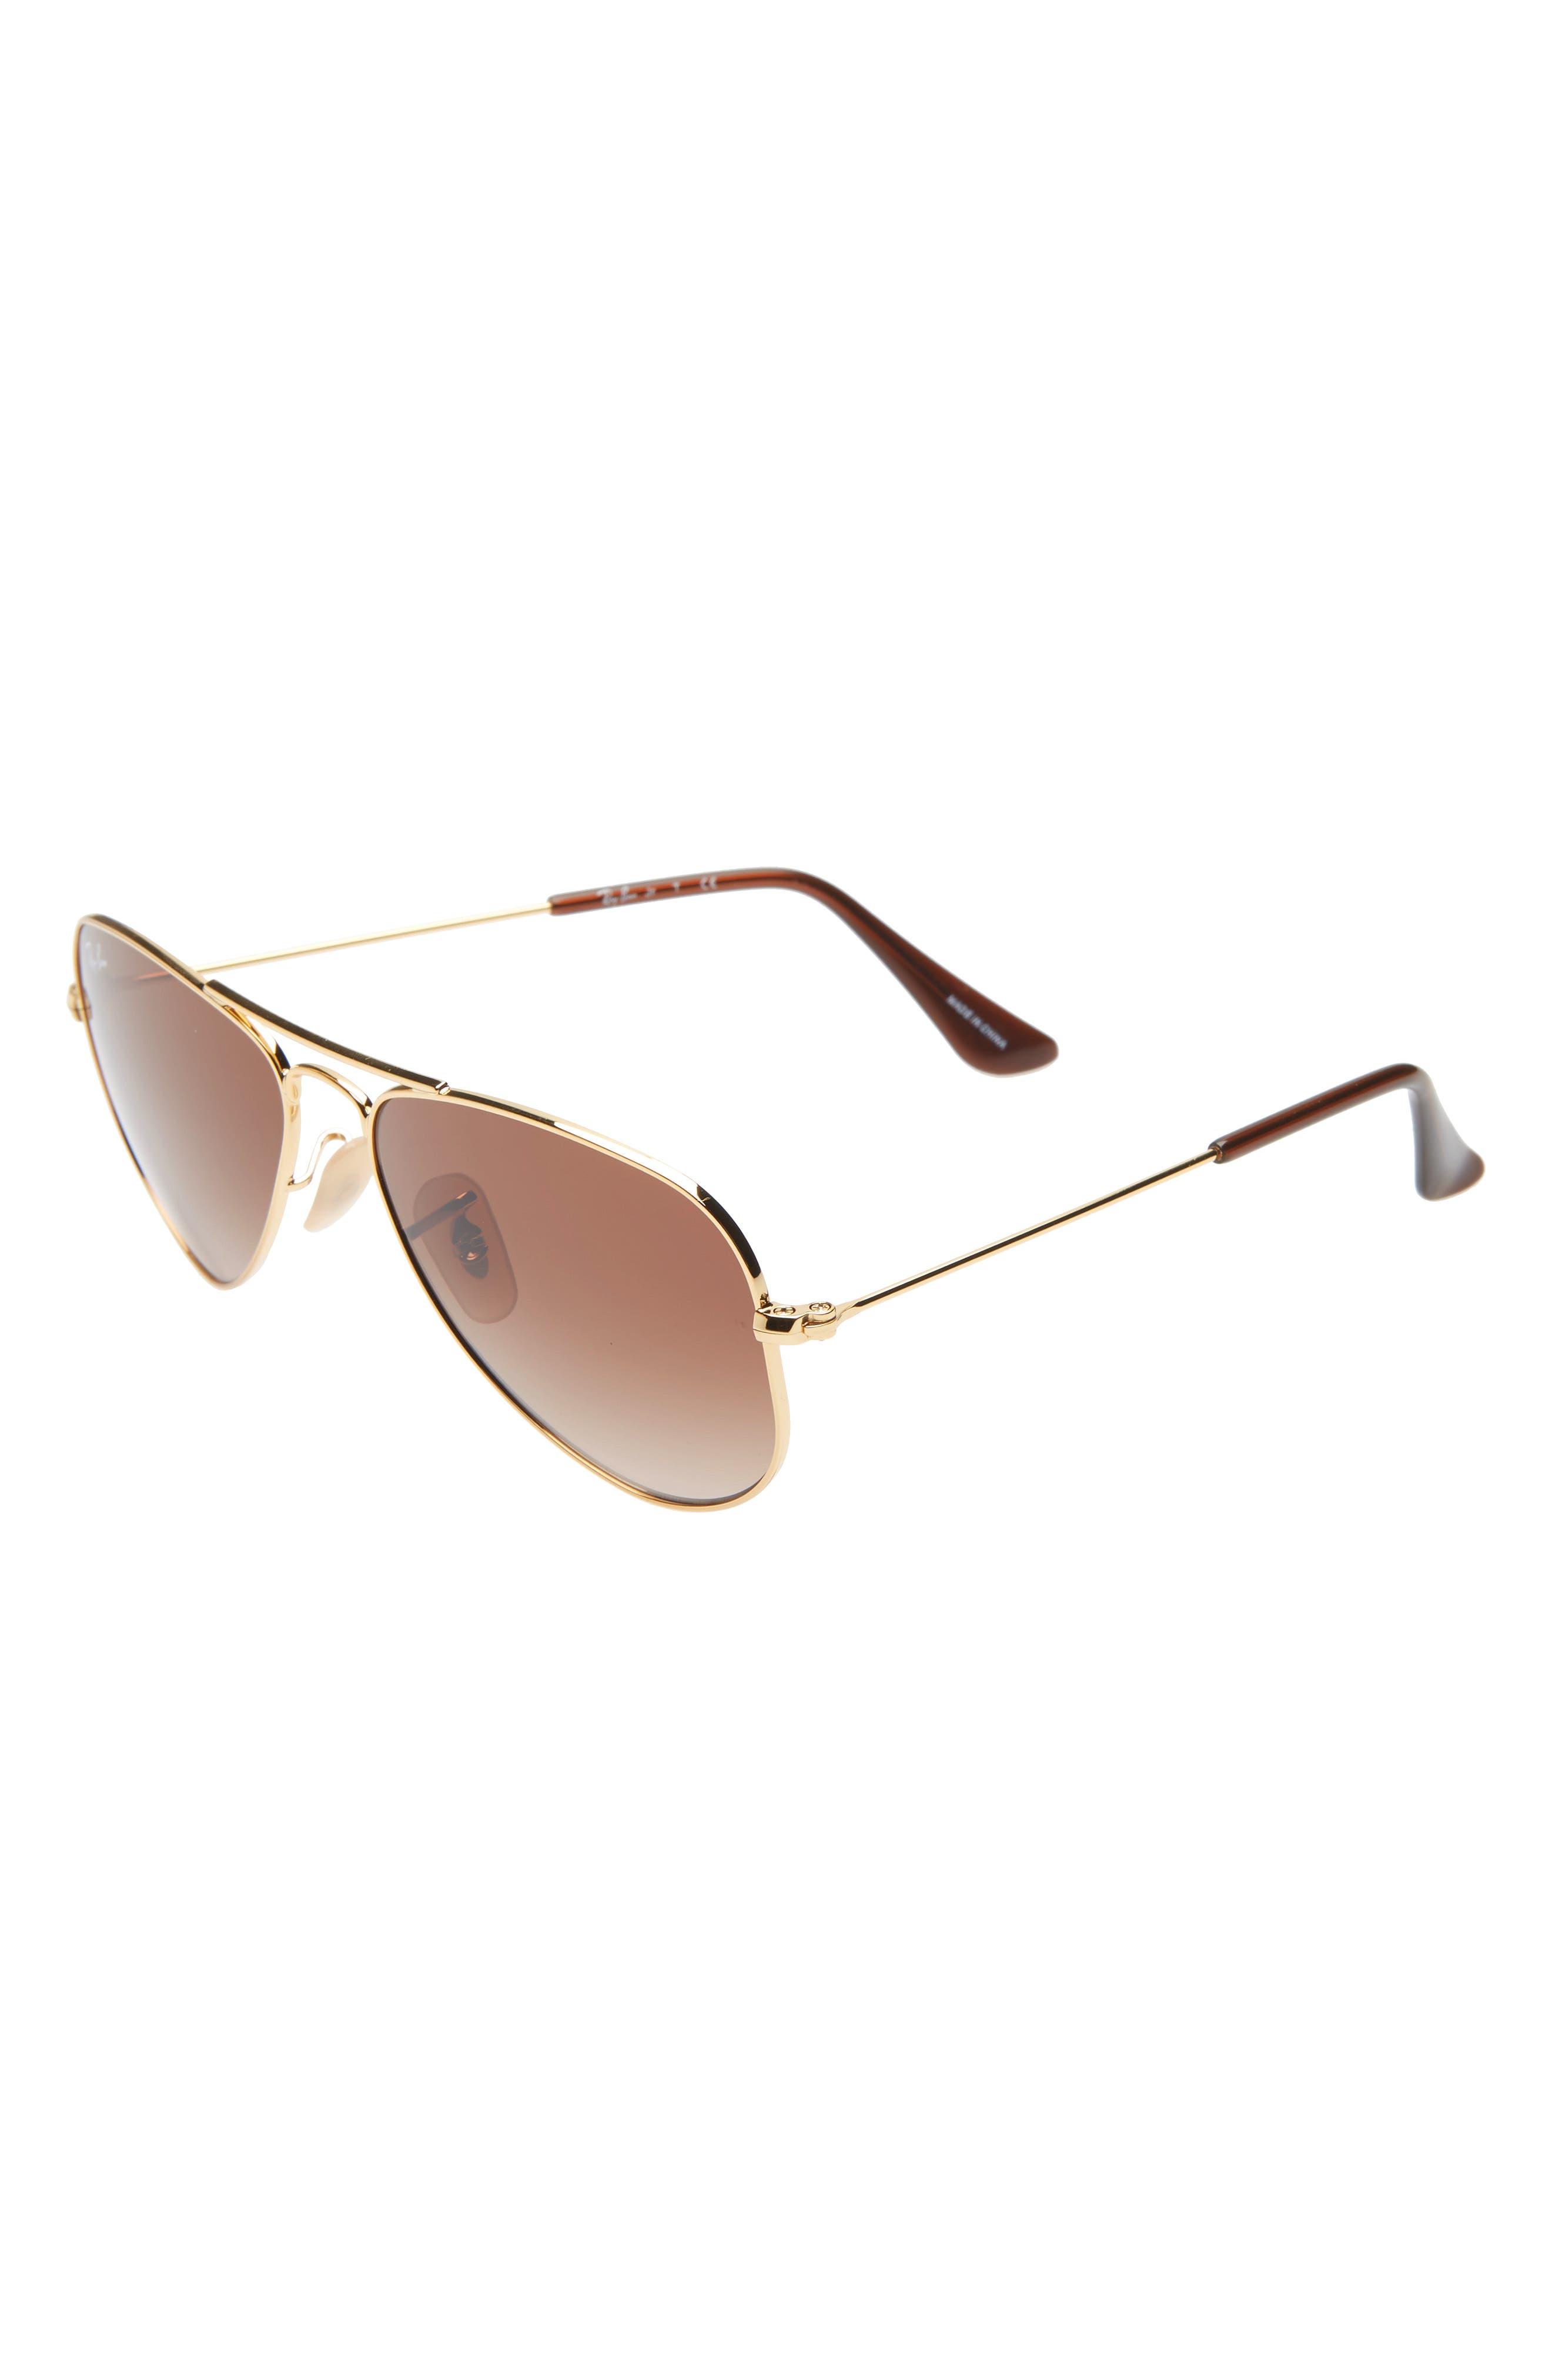 RAY-BAN, Junior 52mm Aviator Sunglasses, Main thumbnail 1, color, GOLD/ BROWN GRADIENT